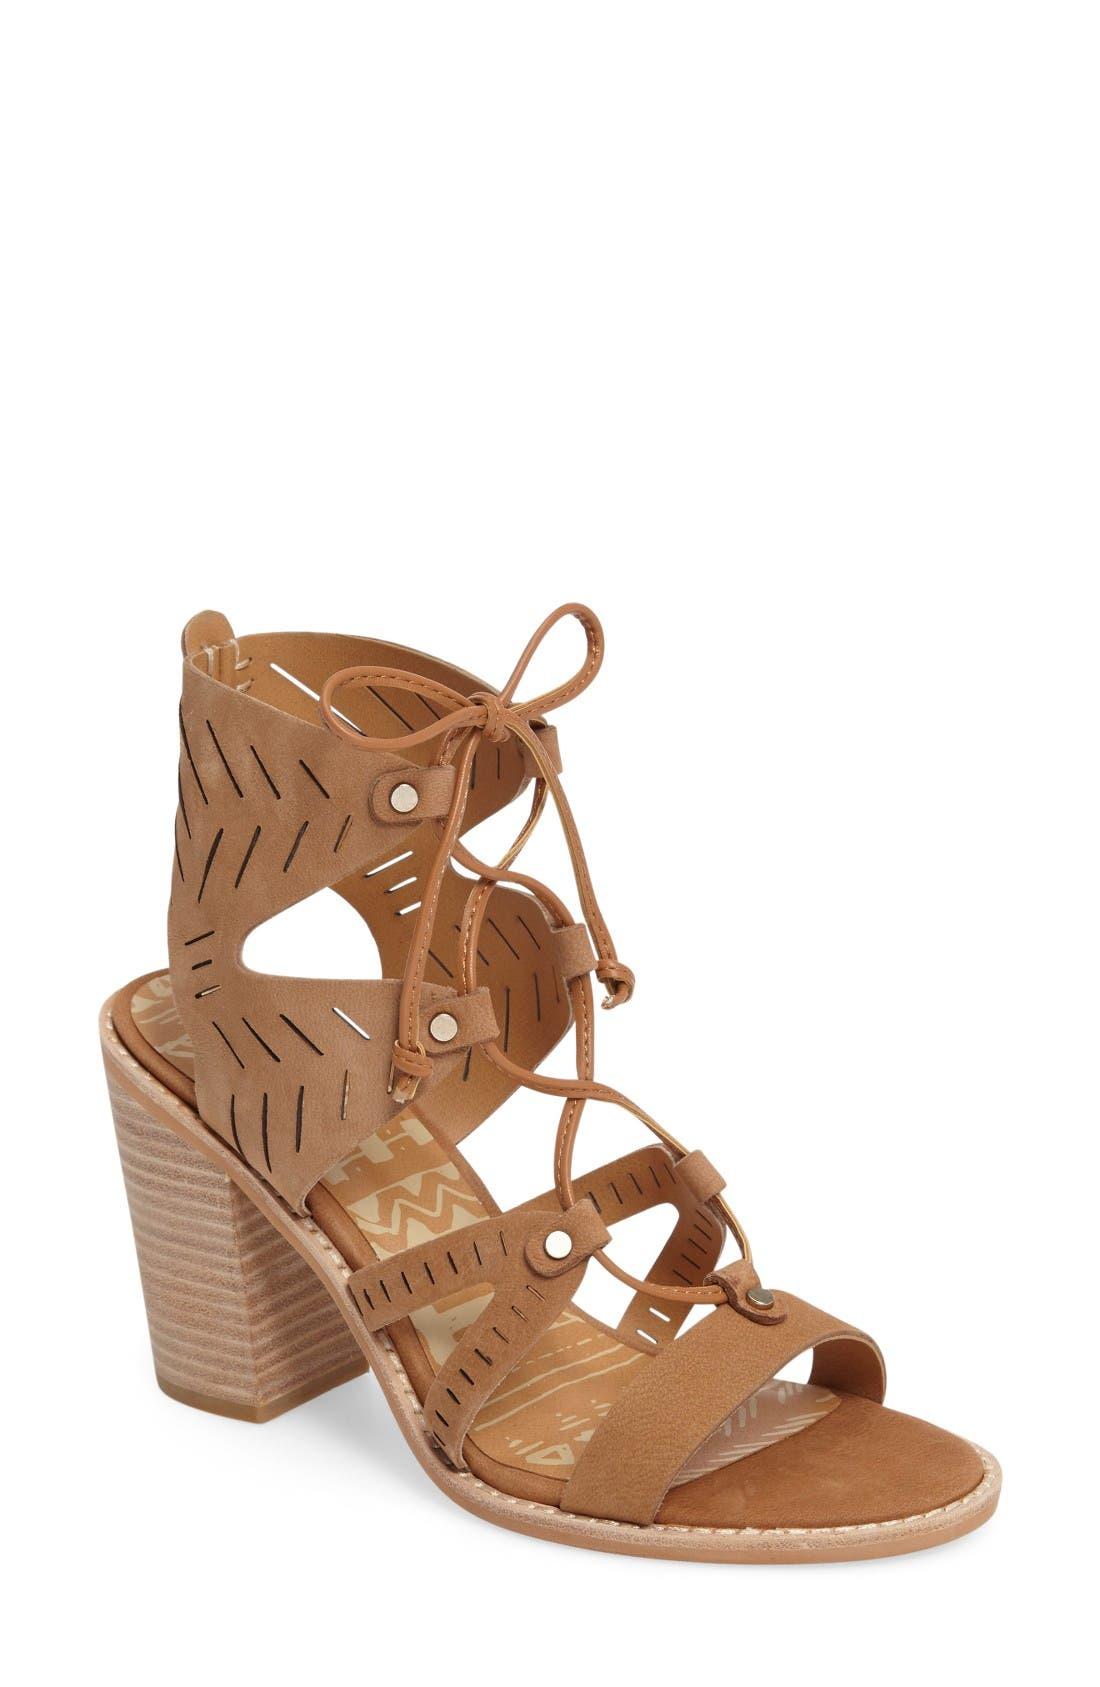 Main Image - Dolce Vita Luci Ghillie Lace Sandal (Women)